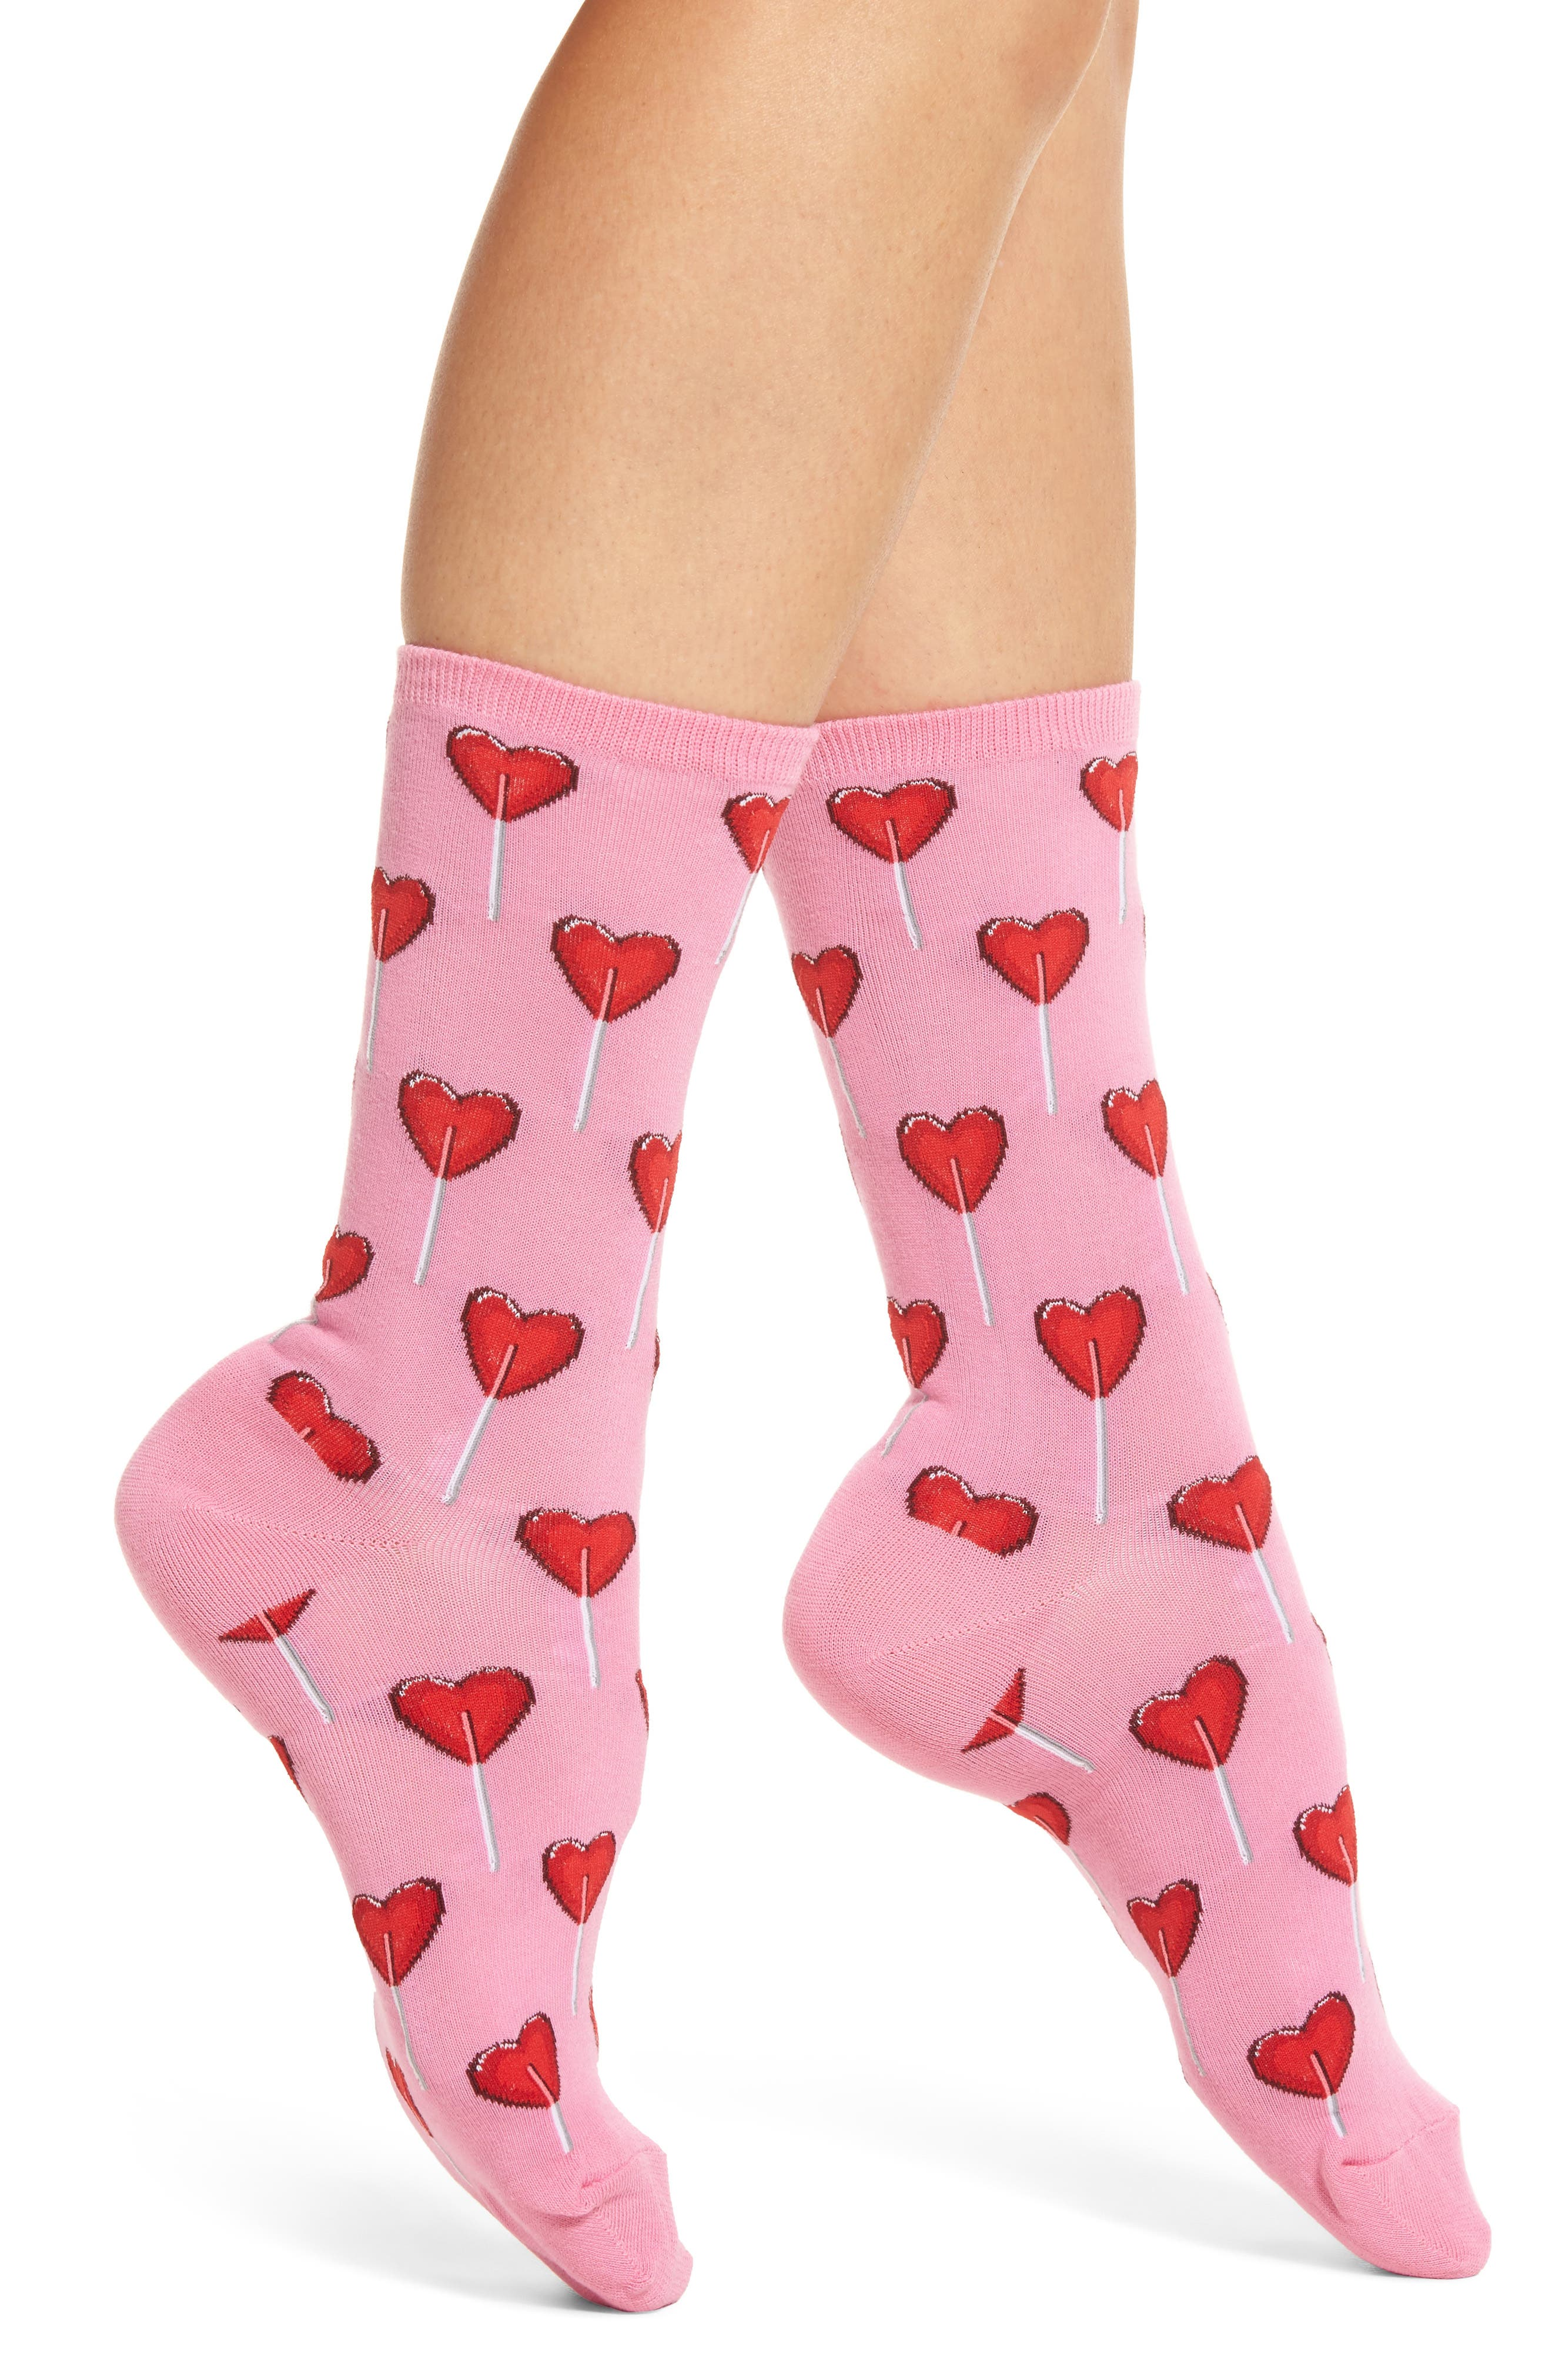 Hot Sox Heart Lollipop Crew Socks